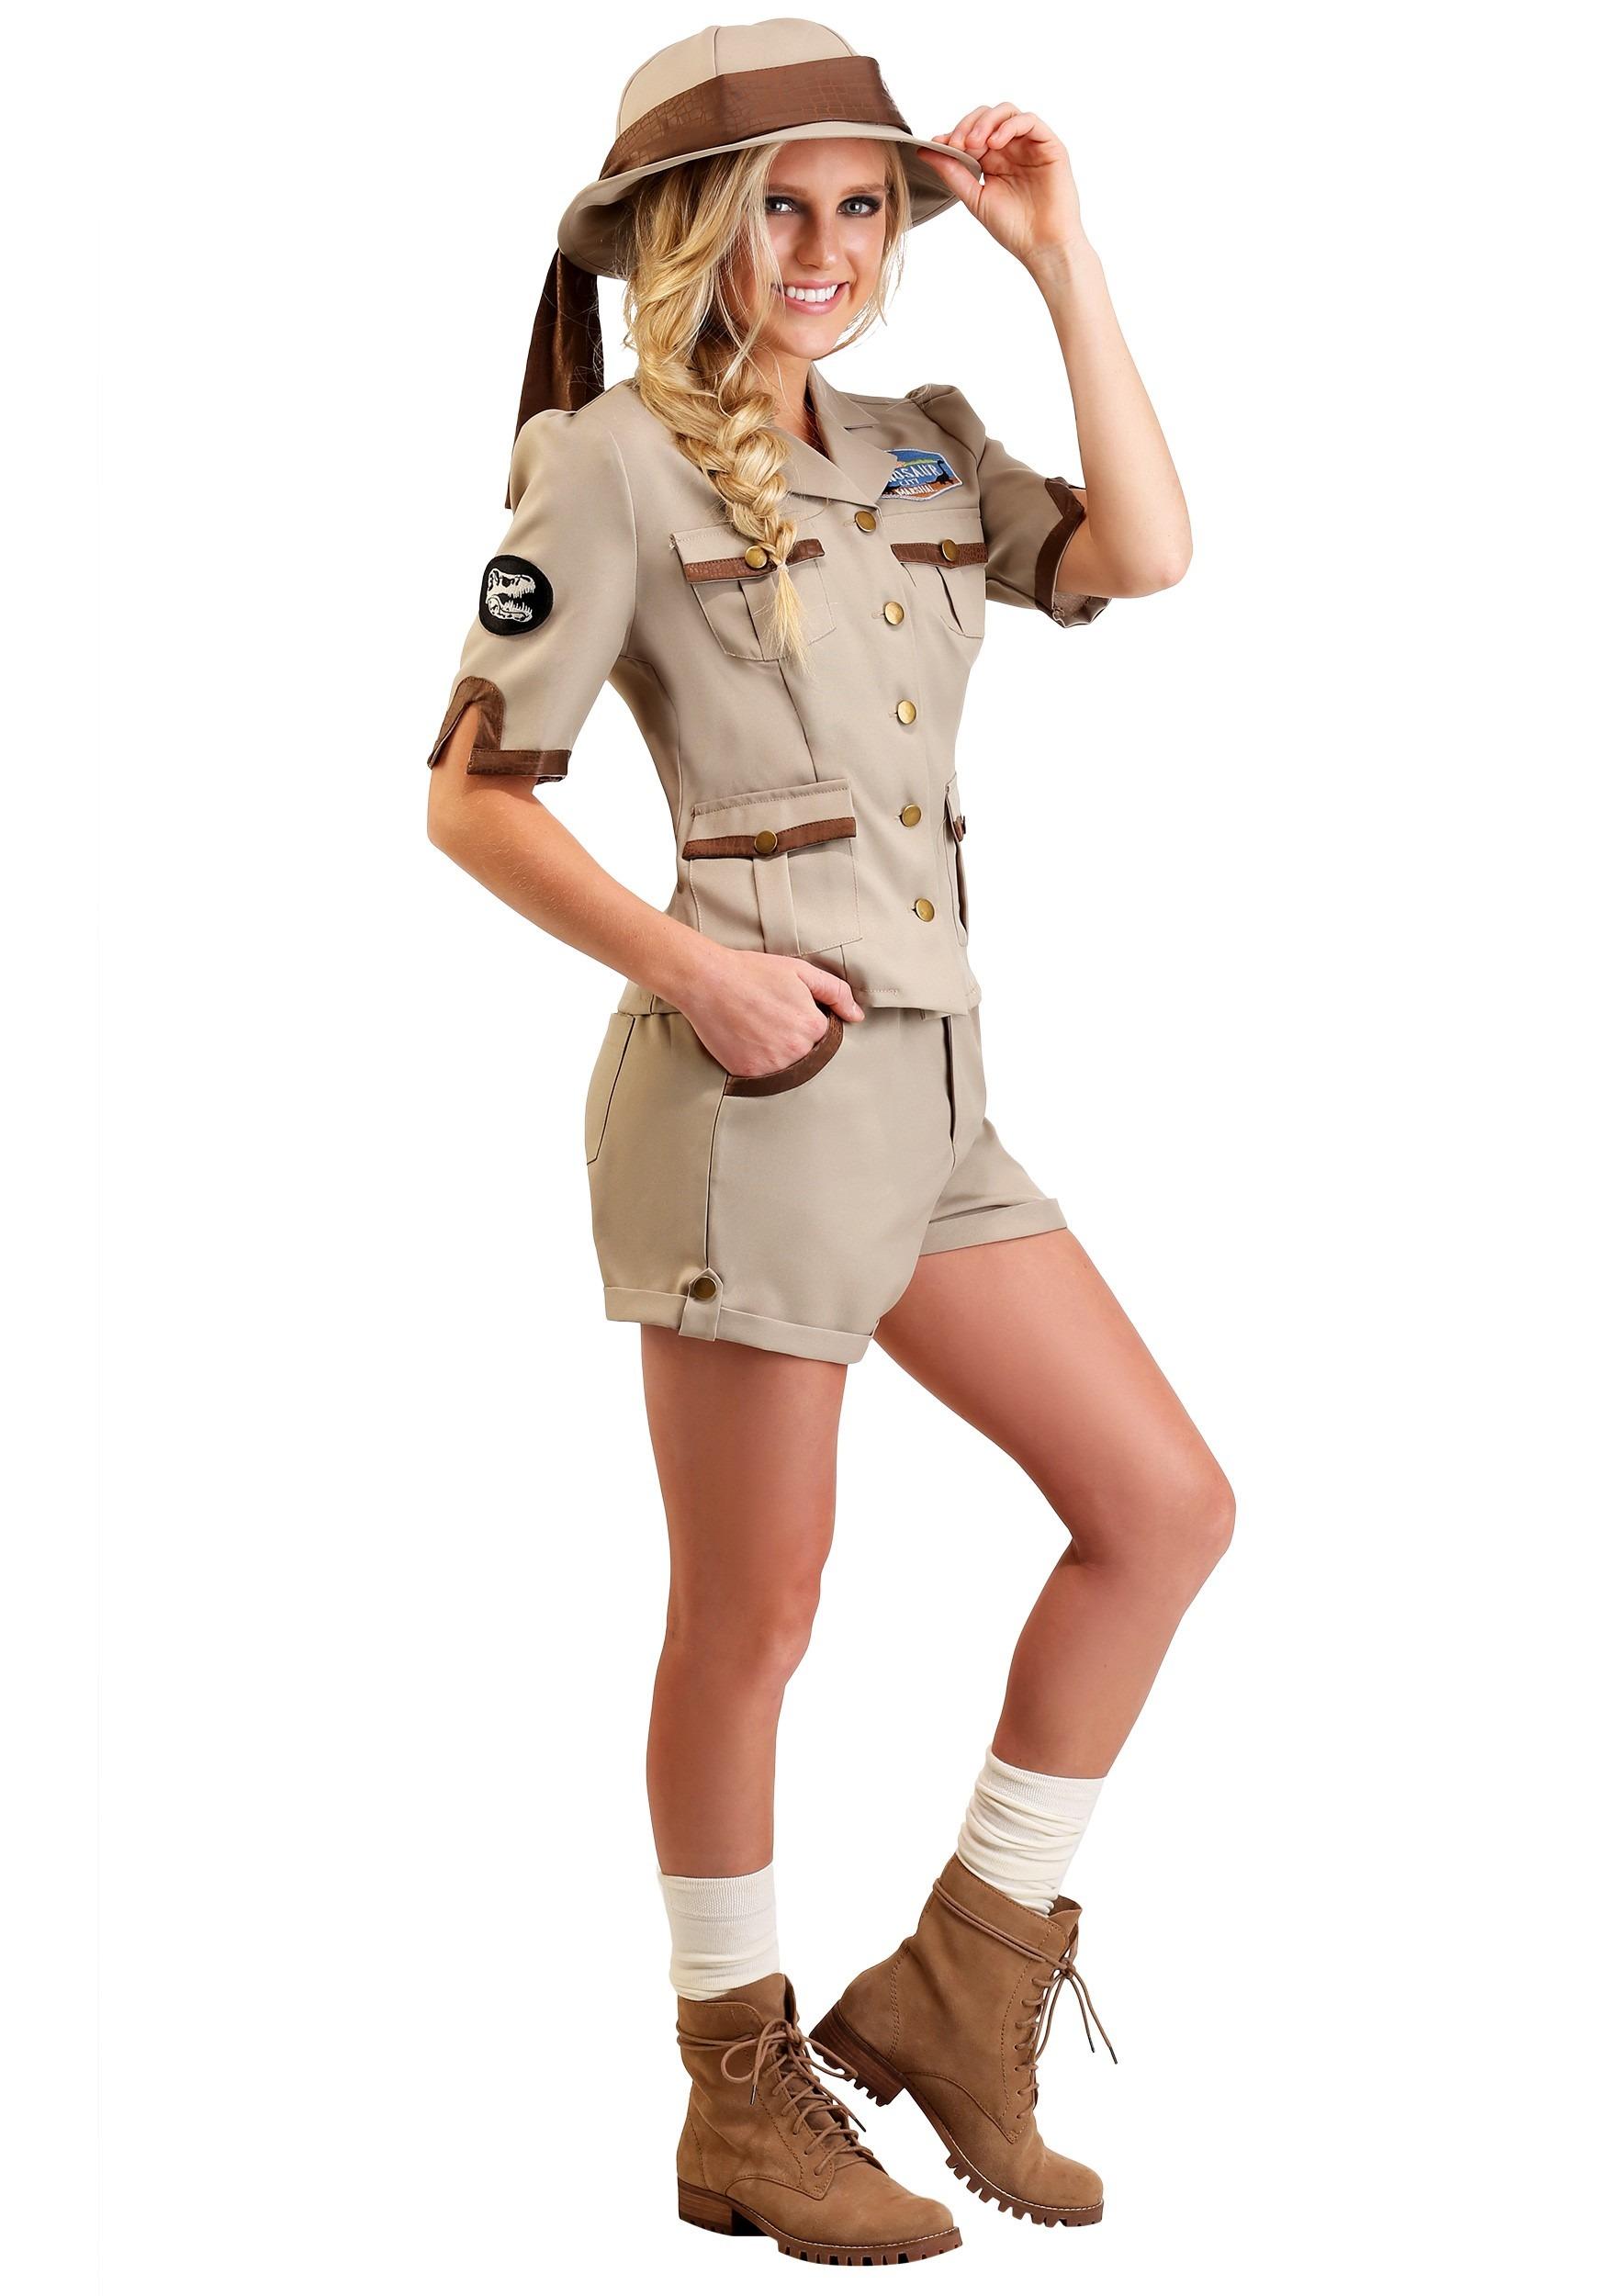 Paleontologist Costume for Women Archaeologist Women's Costume